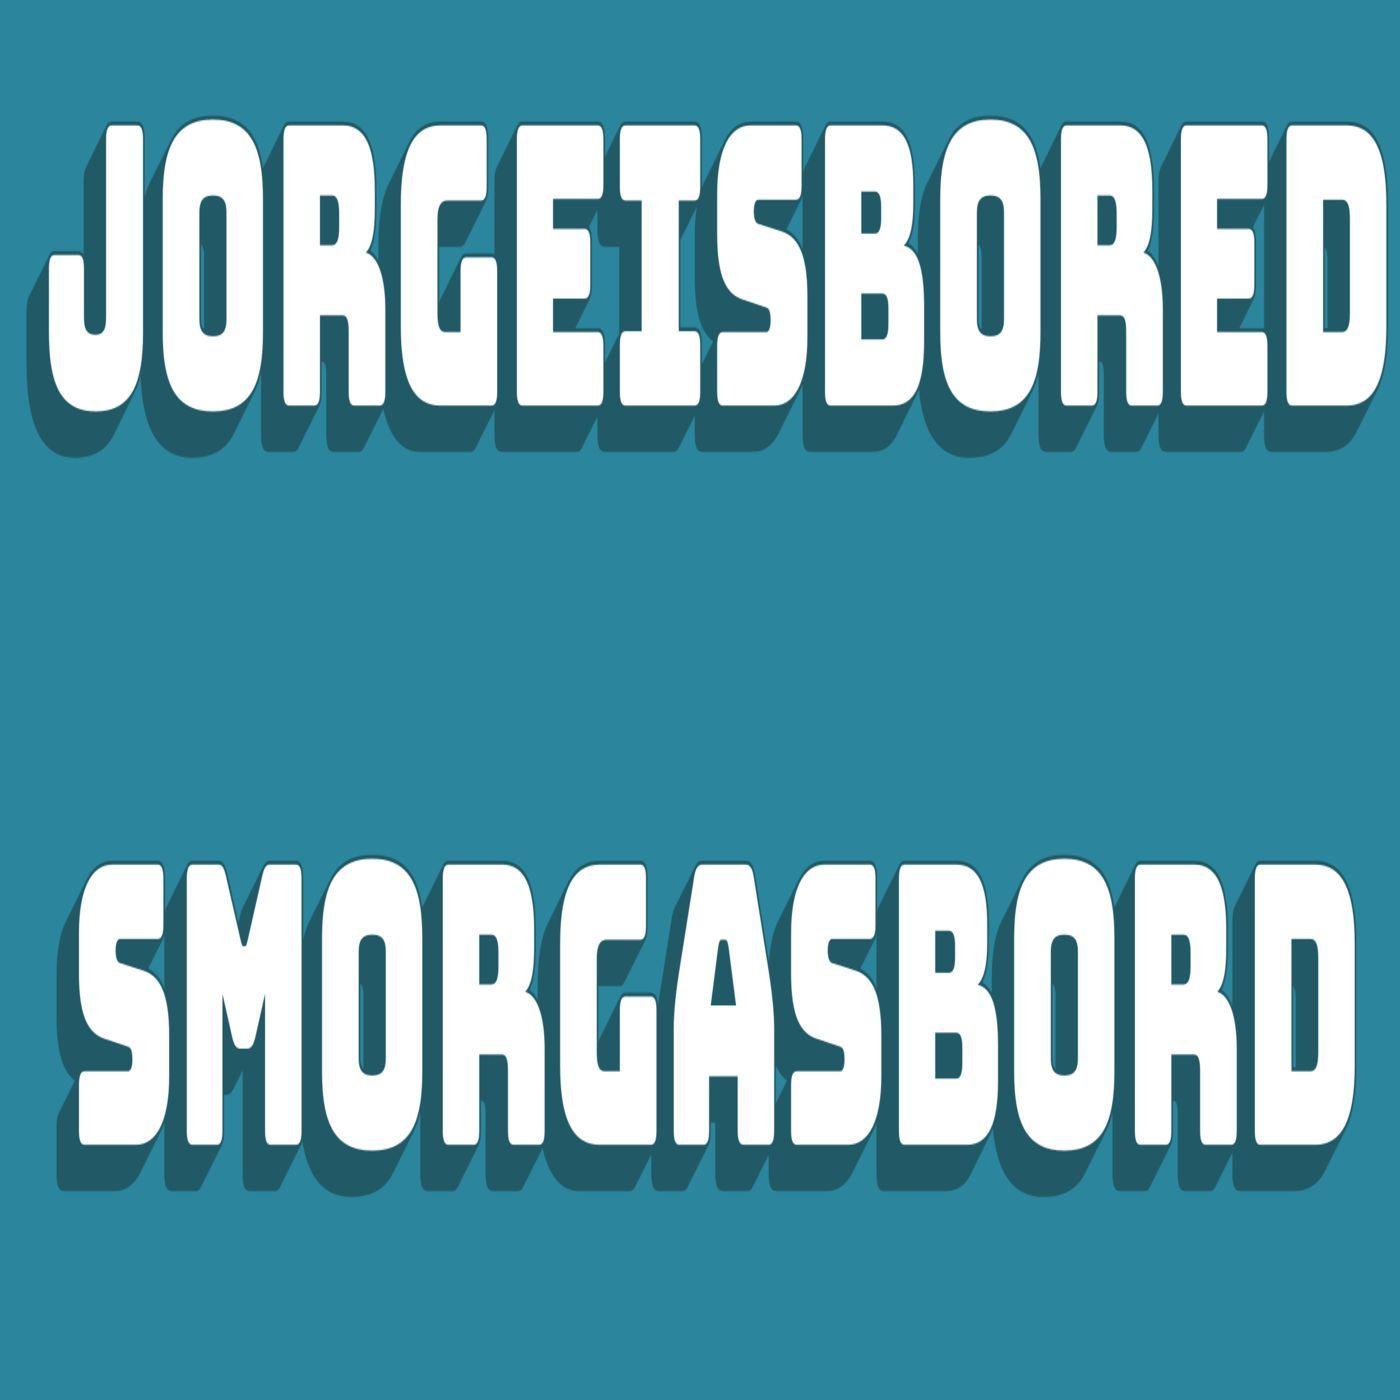 Ecosexual | JorgeIsBored Smorgasbord #1